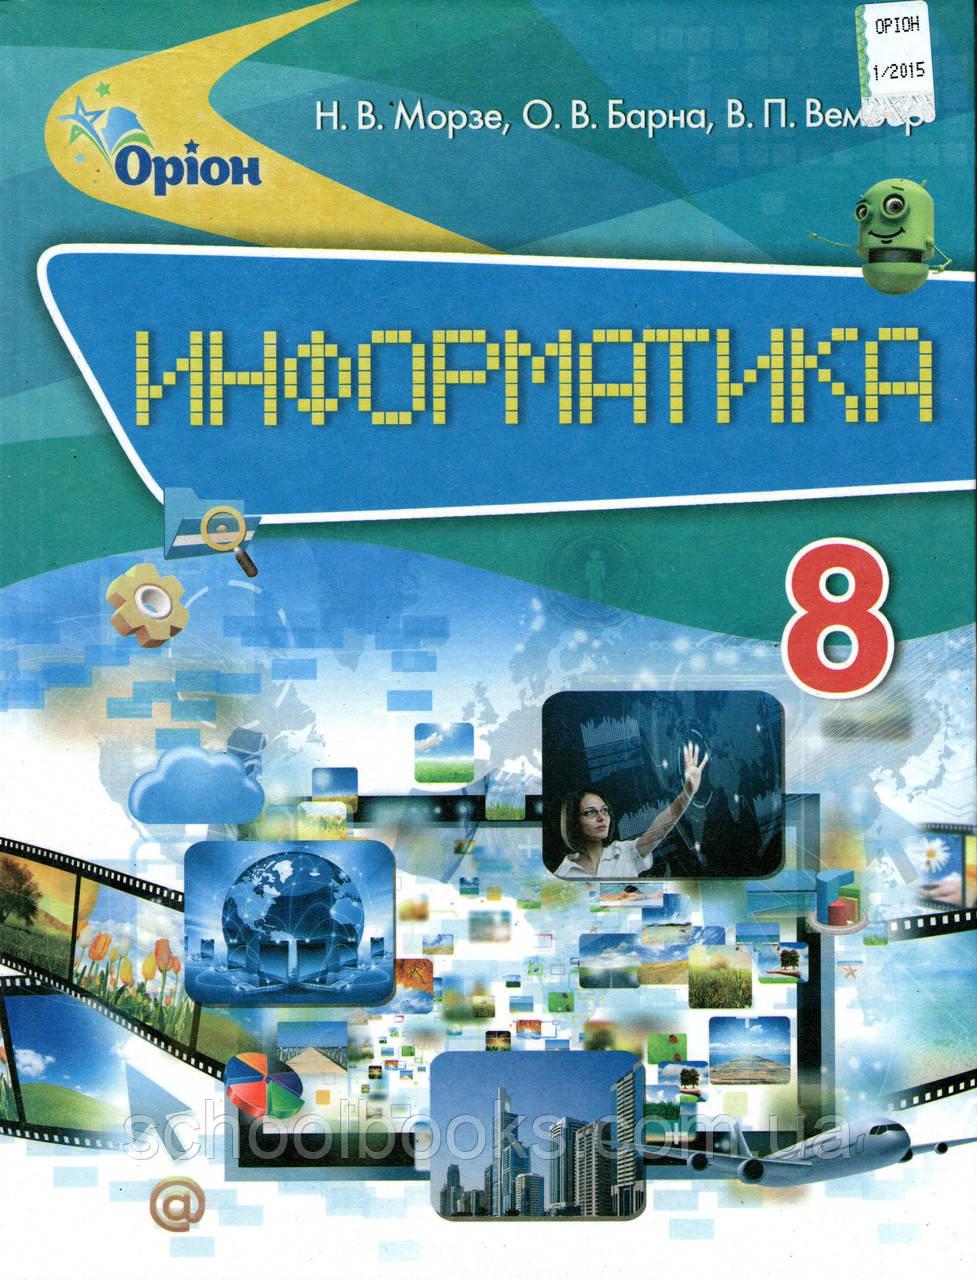 Гдз к учебнику информатика 6 класс н.в. морзе